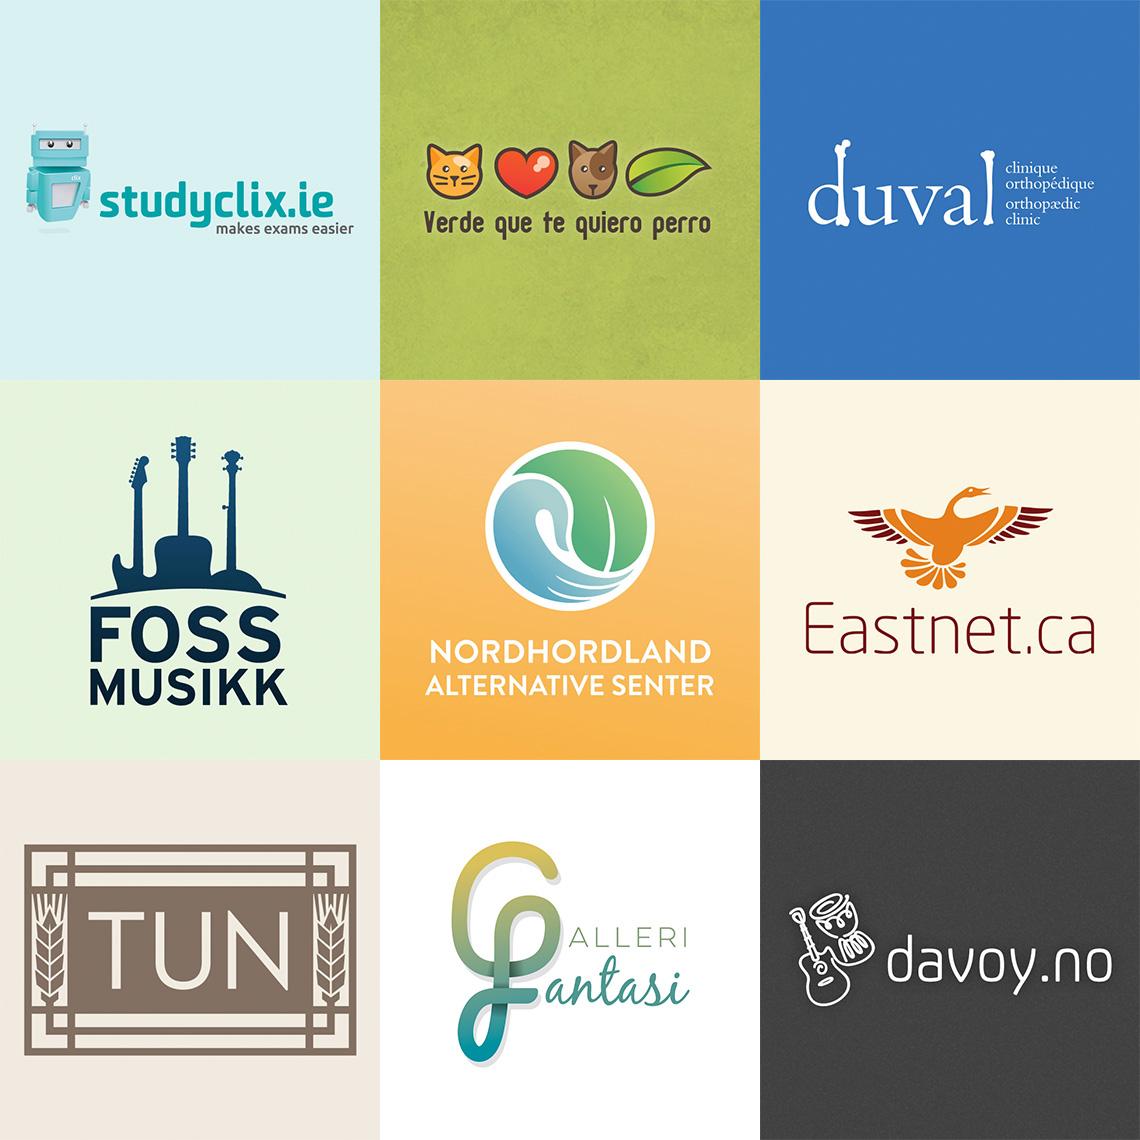 Logos for studyclix.ie, Verde que te quiero perro, Duval orthopaedic clinic, Foss musikk, Nordhordland alternative senter, Eastnet.ca, Tun Øl, Galleri fantasi and davoy.no